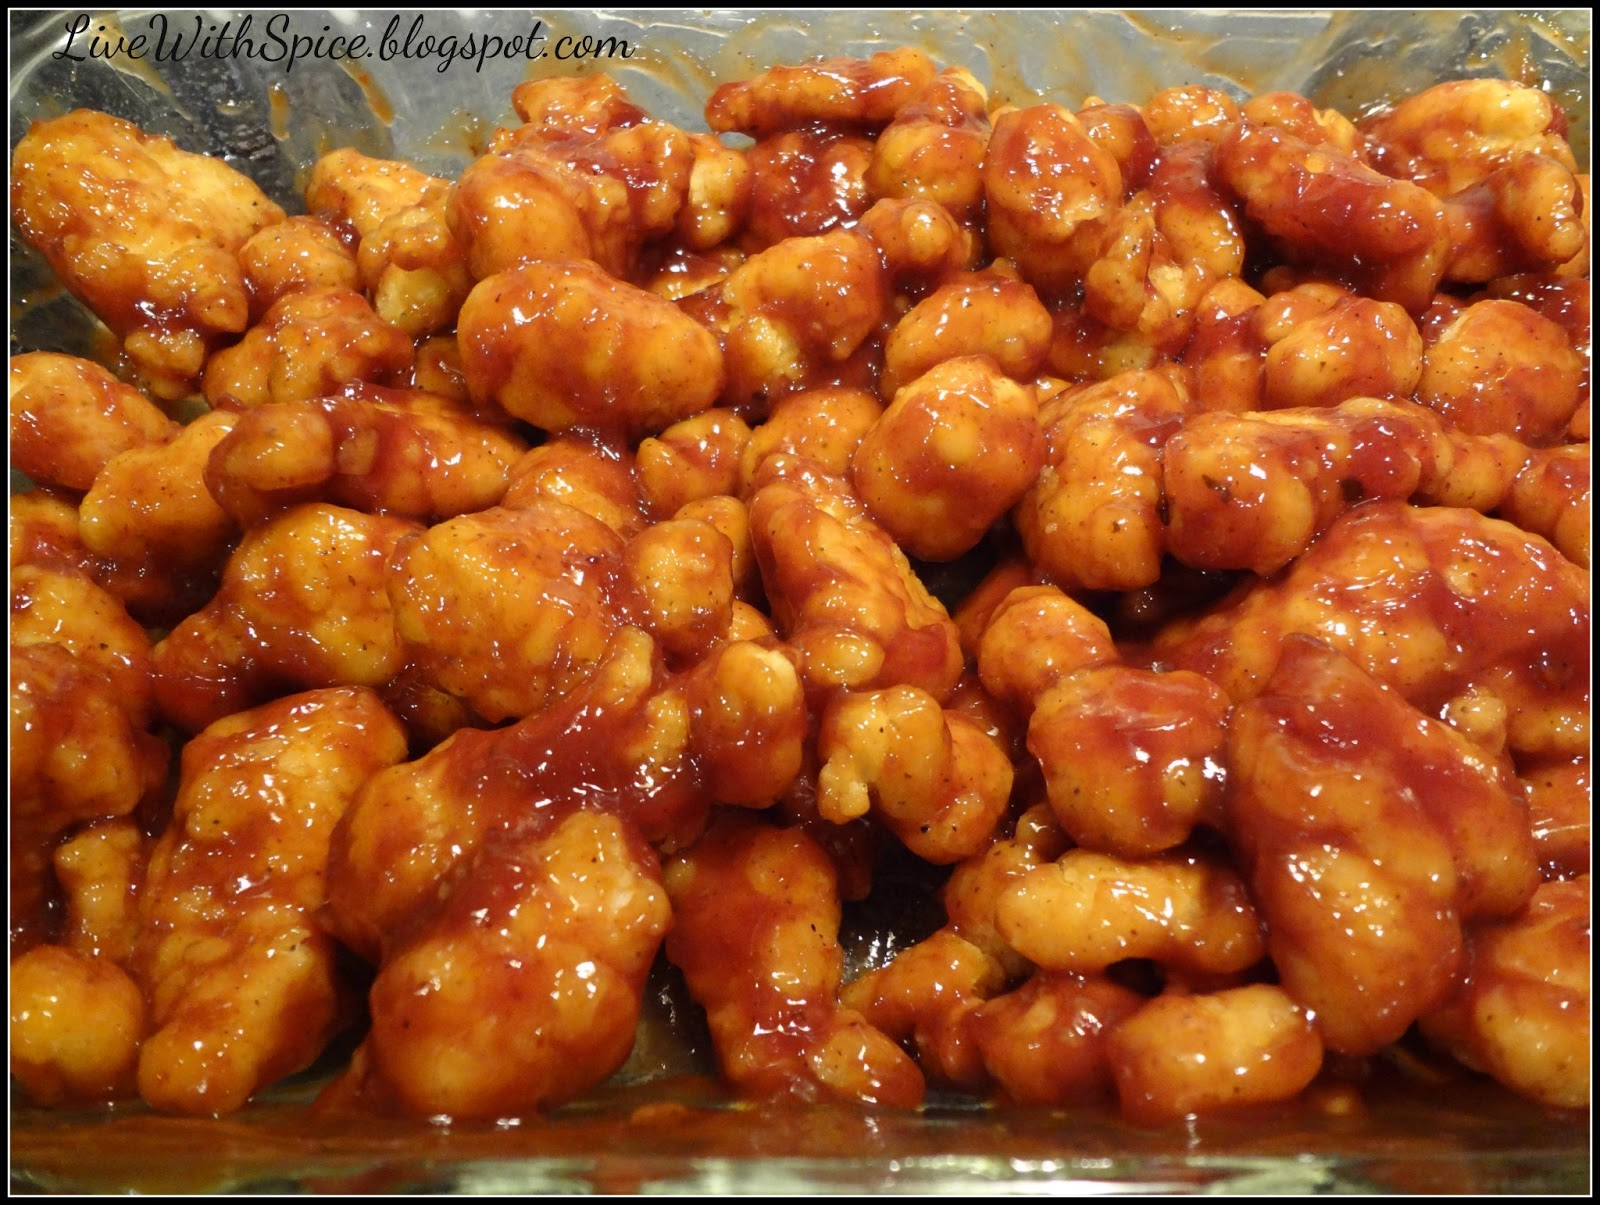 Live With Spice: Honey BBQ Popcorn Chicken